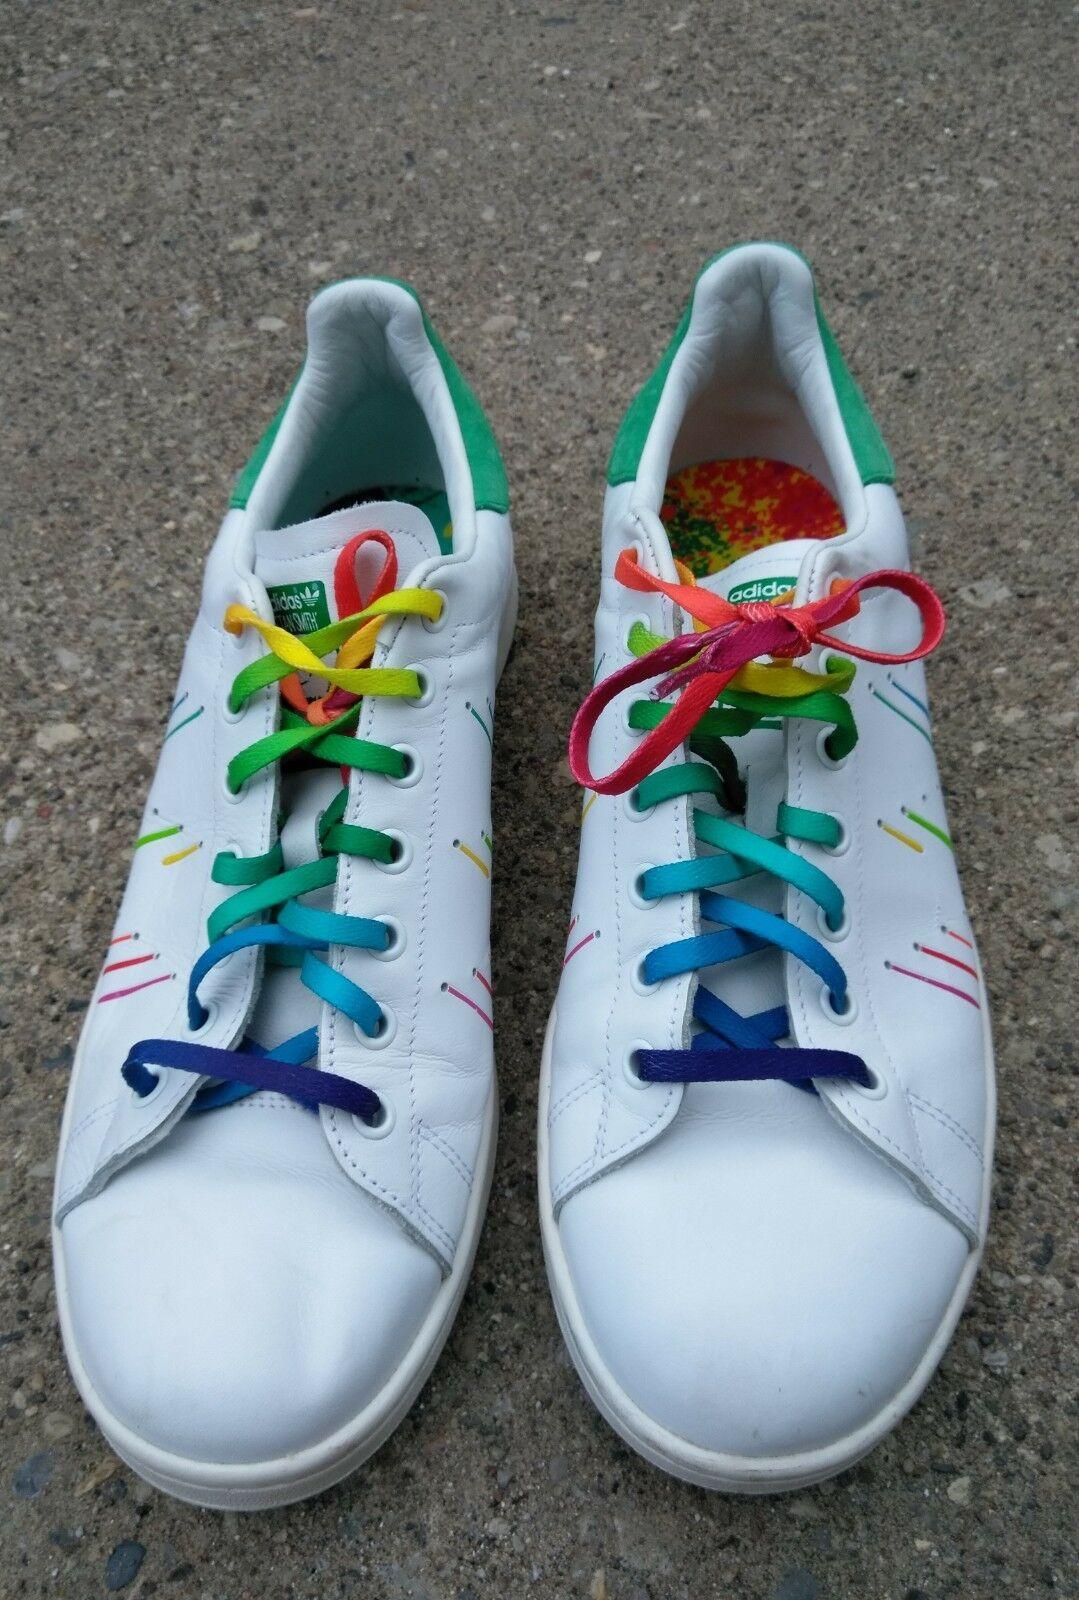 Adidas Adidas Adidas Stan Smith Men Sneakers b2e7b6